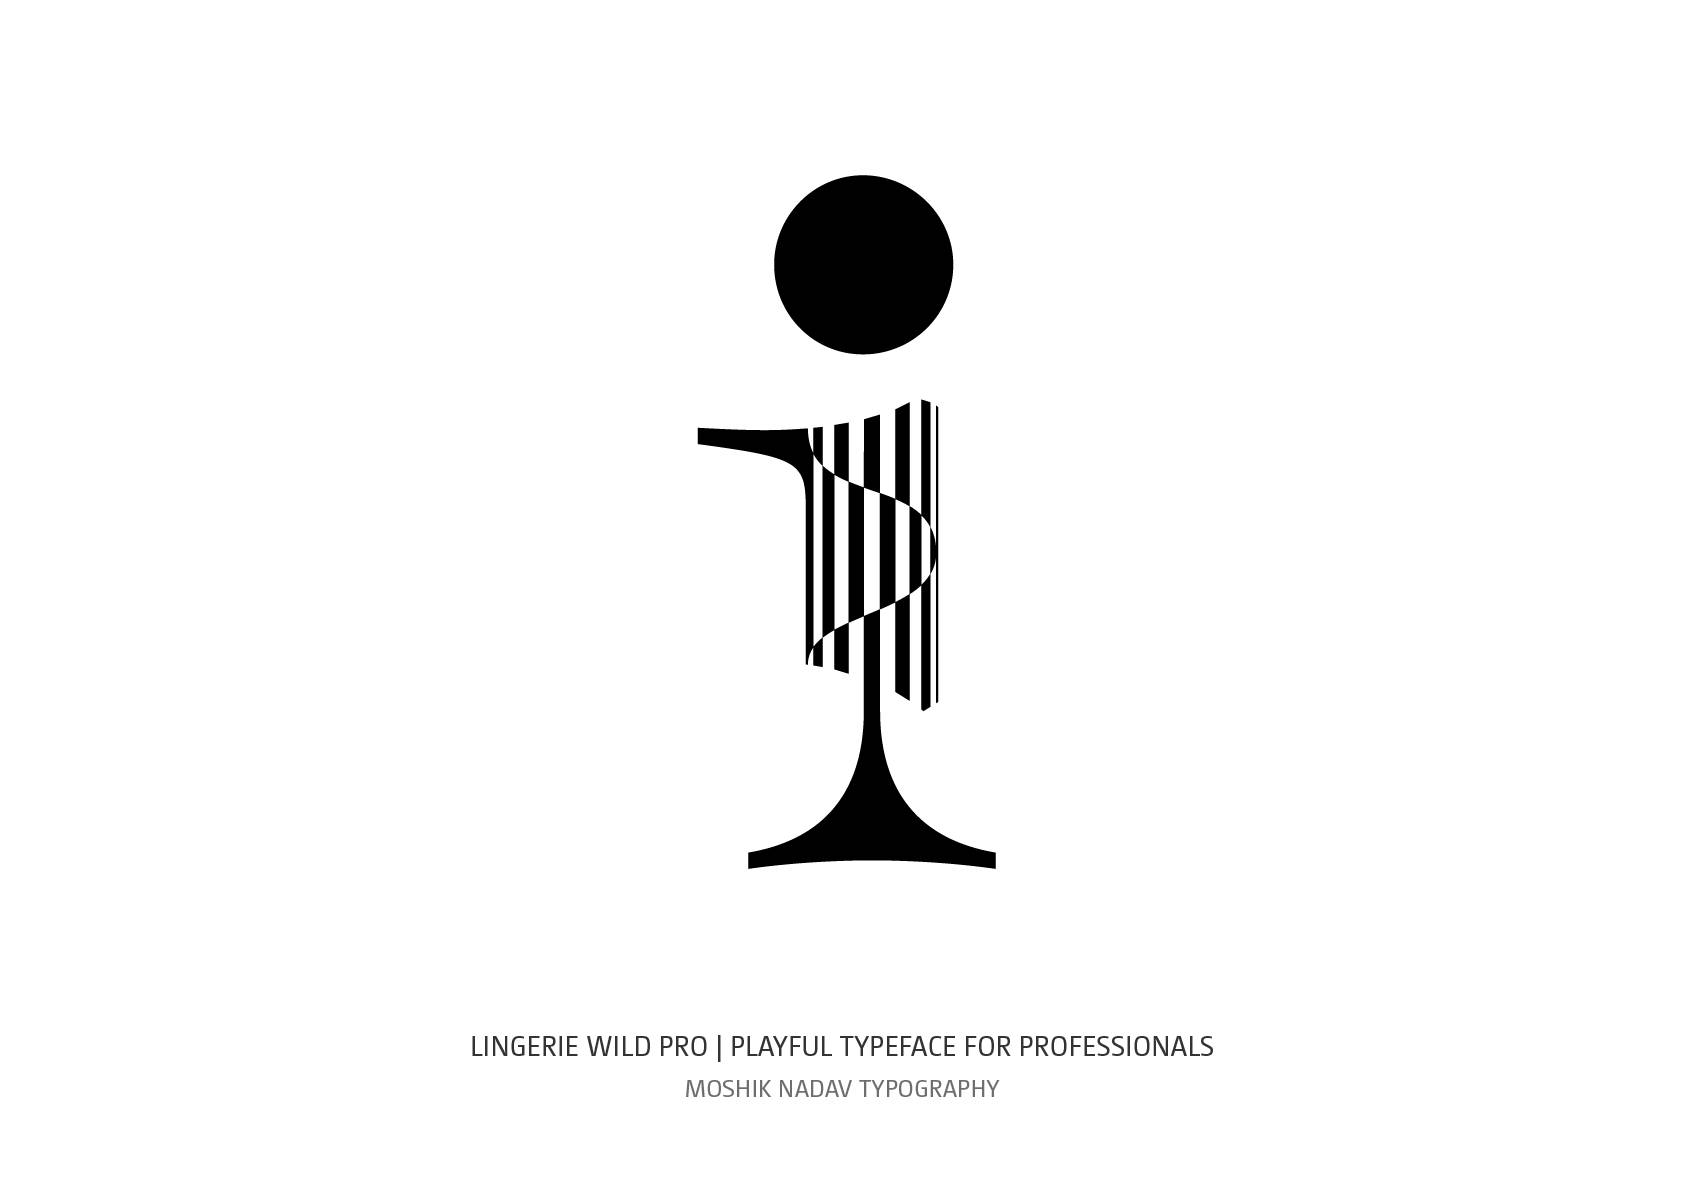 Beautiful lowercase i by Moshik Nadav Fashion Typography NYC design studio